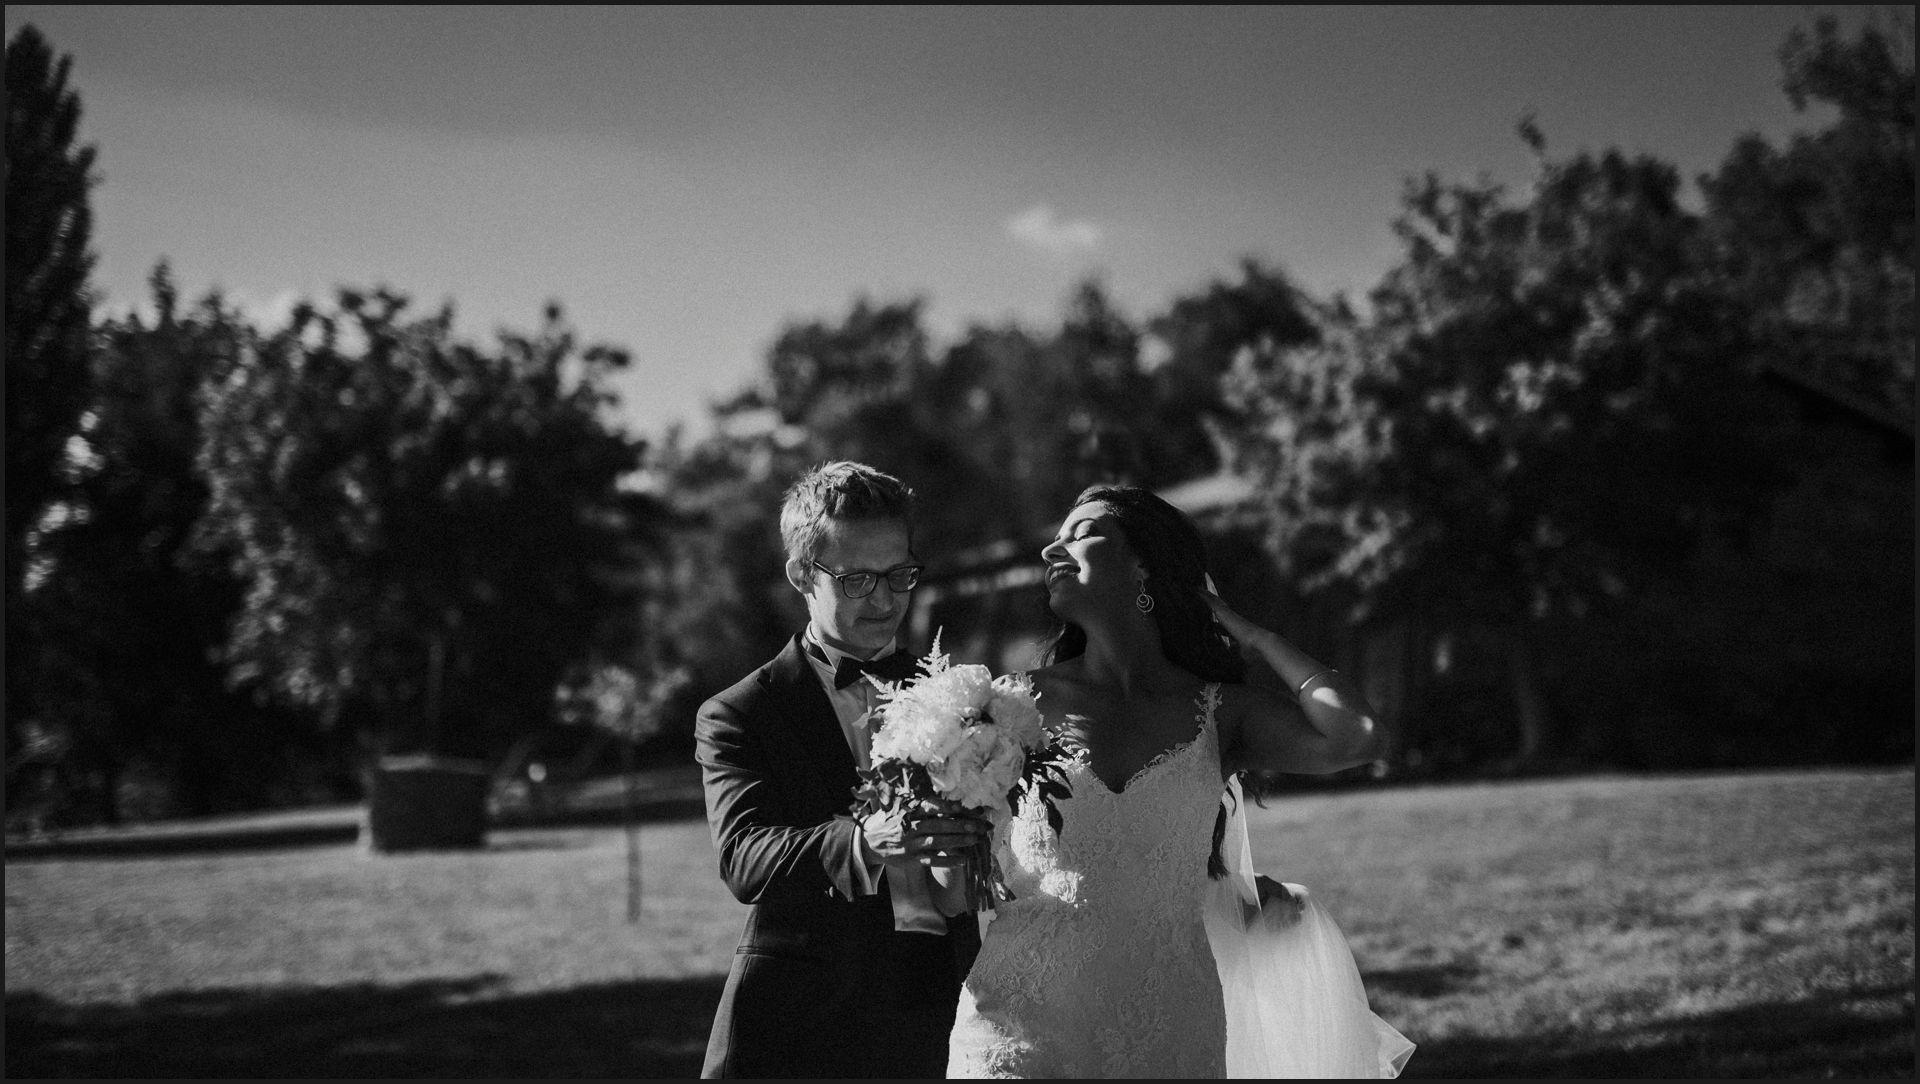 black and white, wedding, umbria, nikis resort, bride, groom, flowers, sun, veil